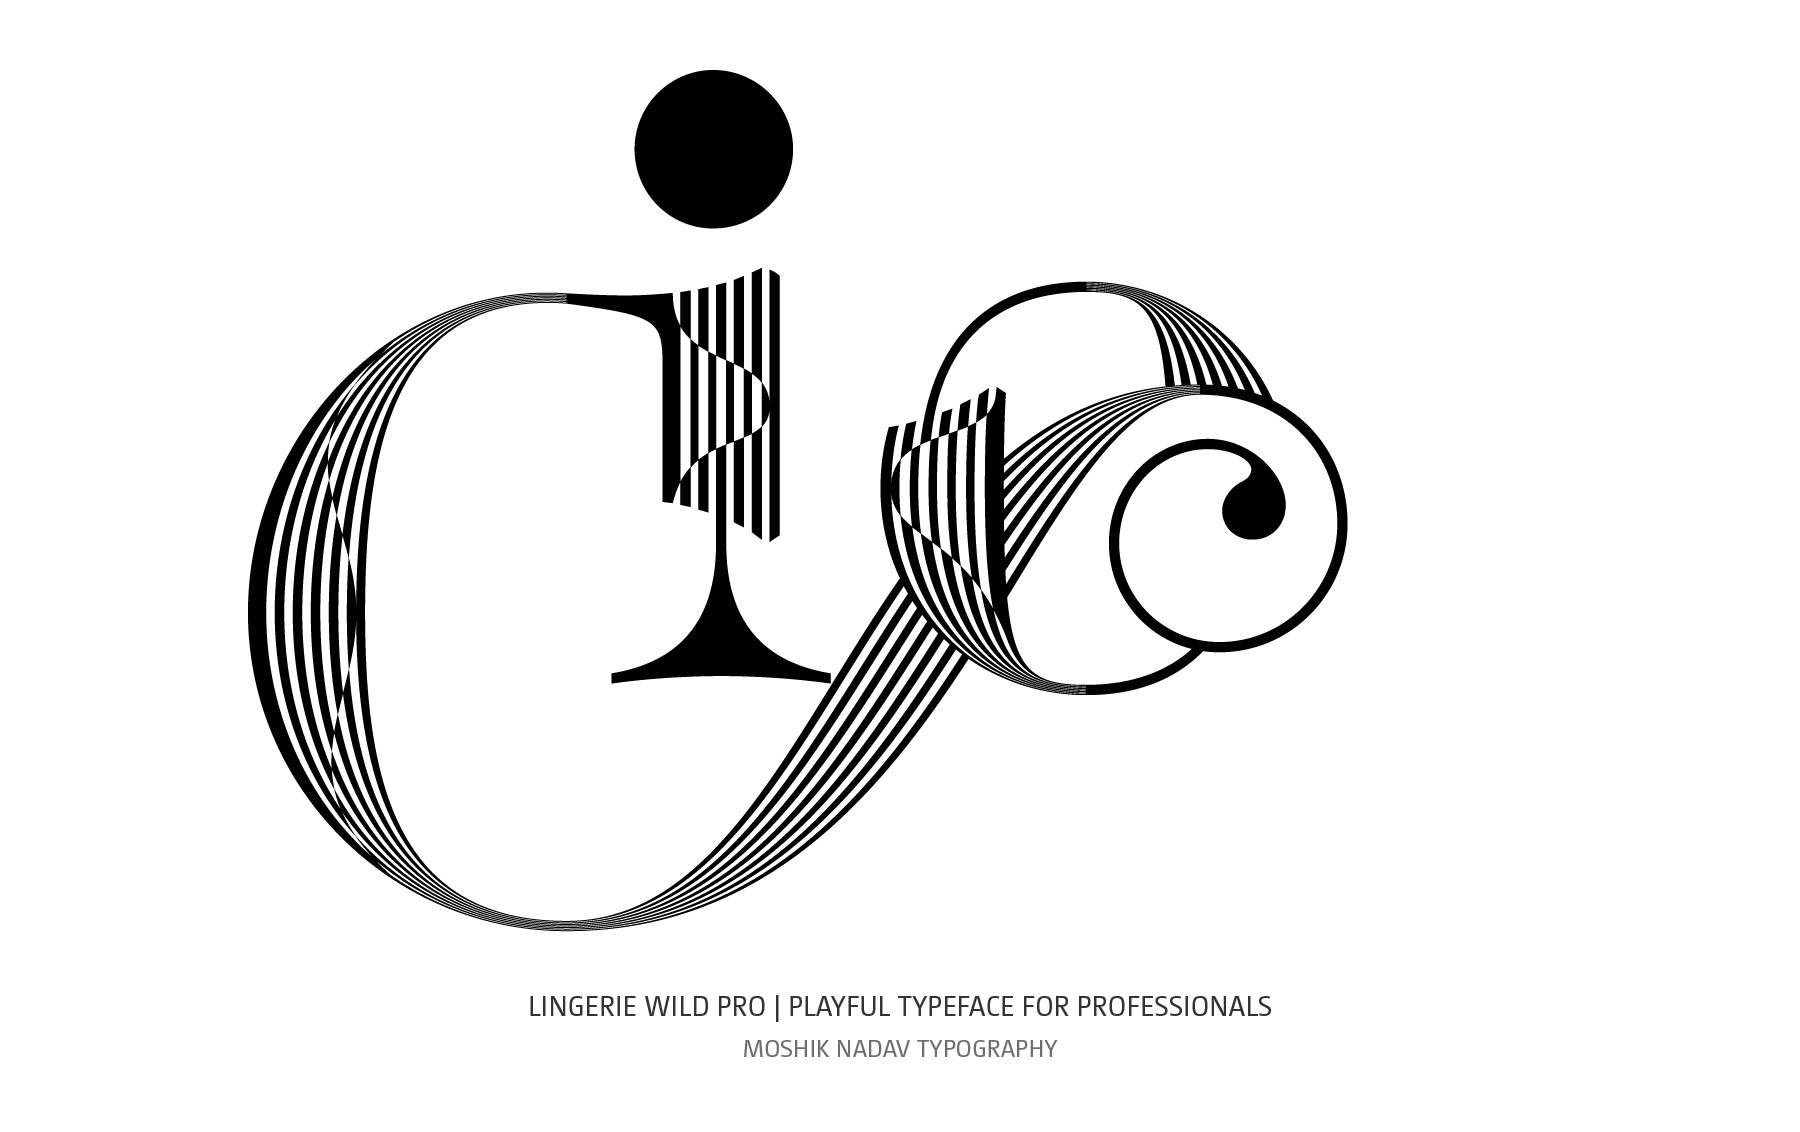 Io sexy ligatures designed with Lingerie Wild Pro Typeface